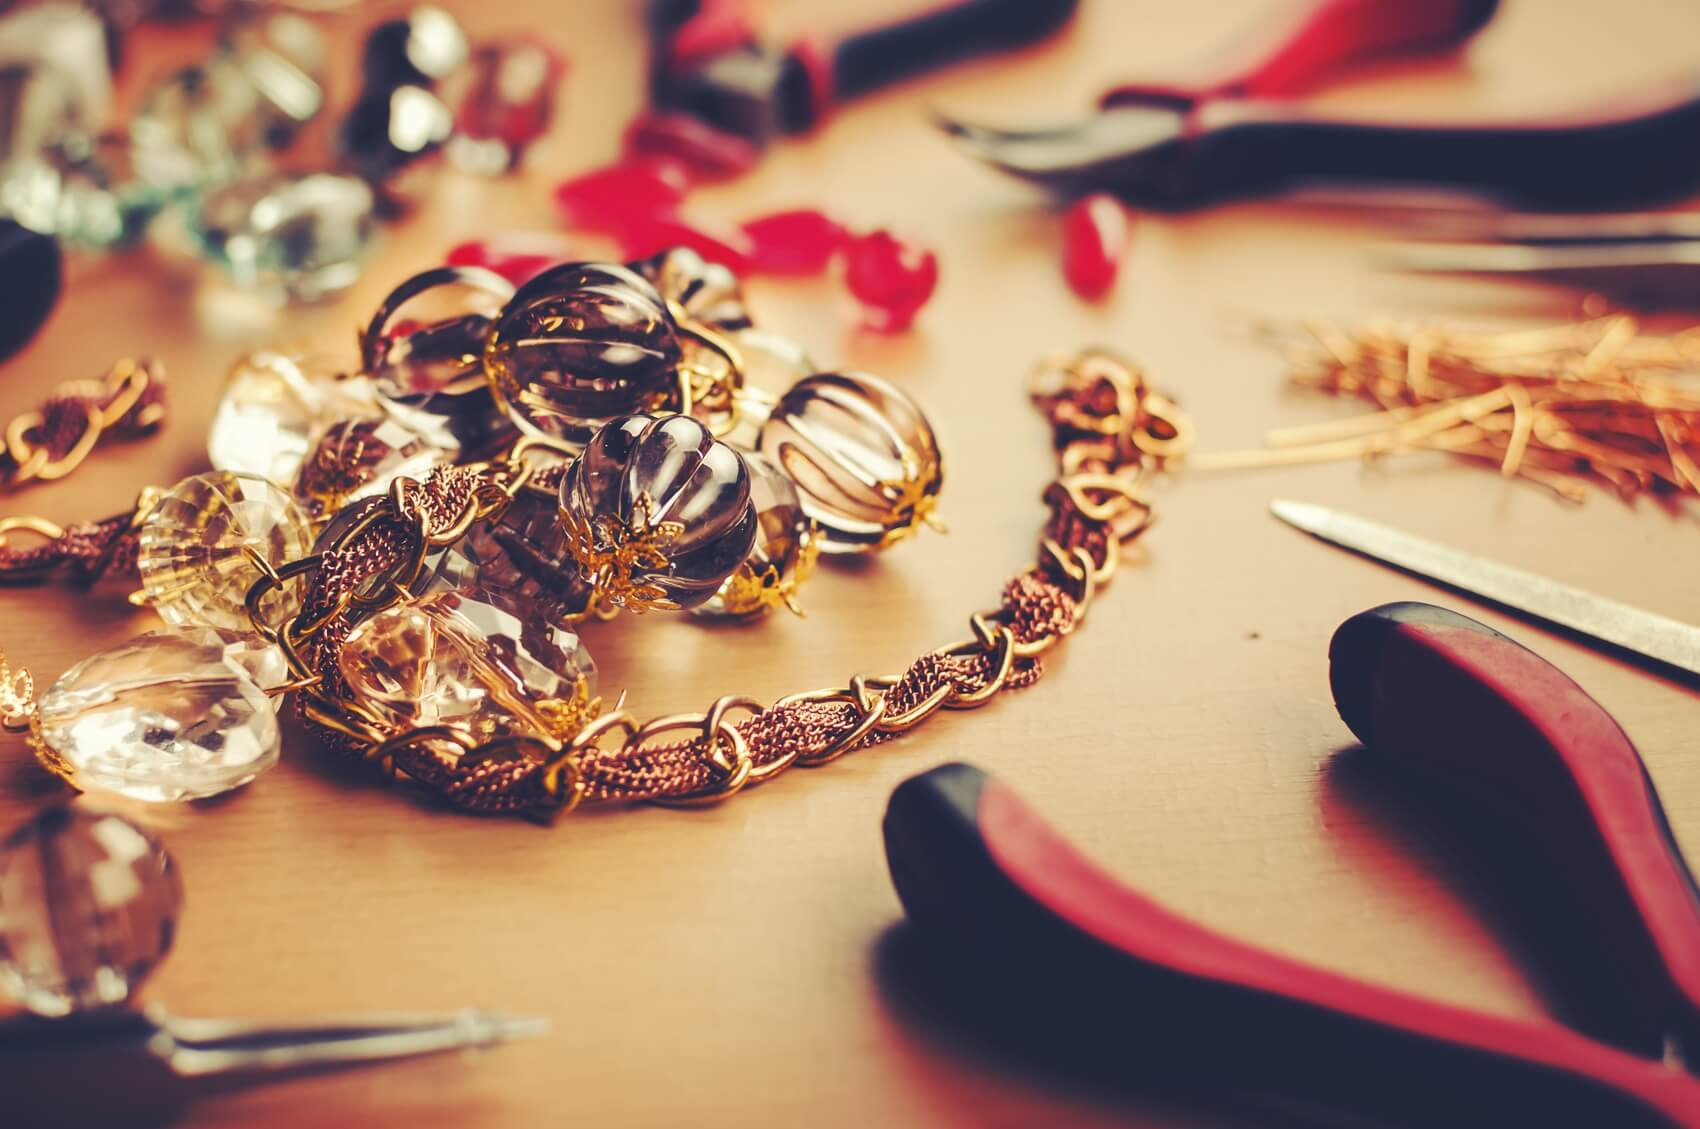 Jewelry-making-000032124800_Medium.jpg.jpeg